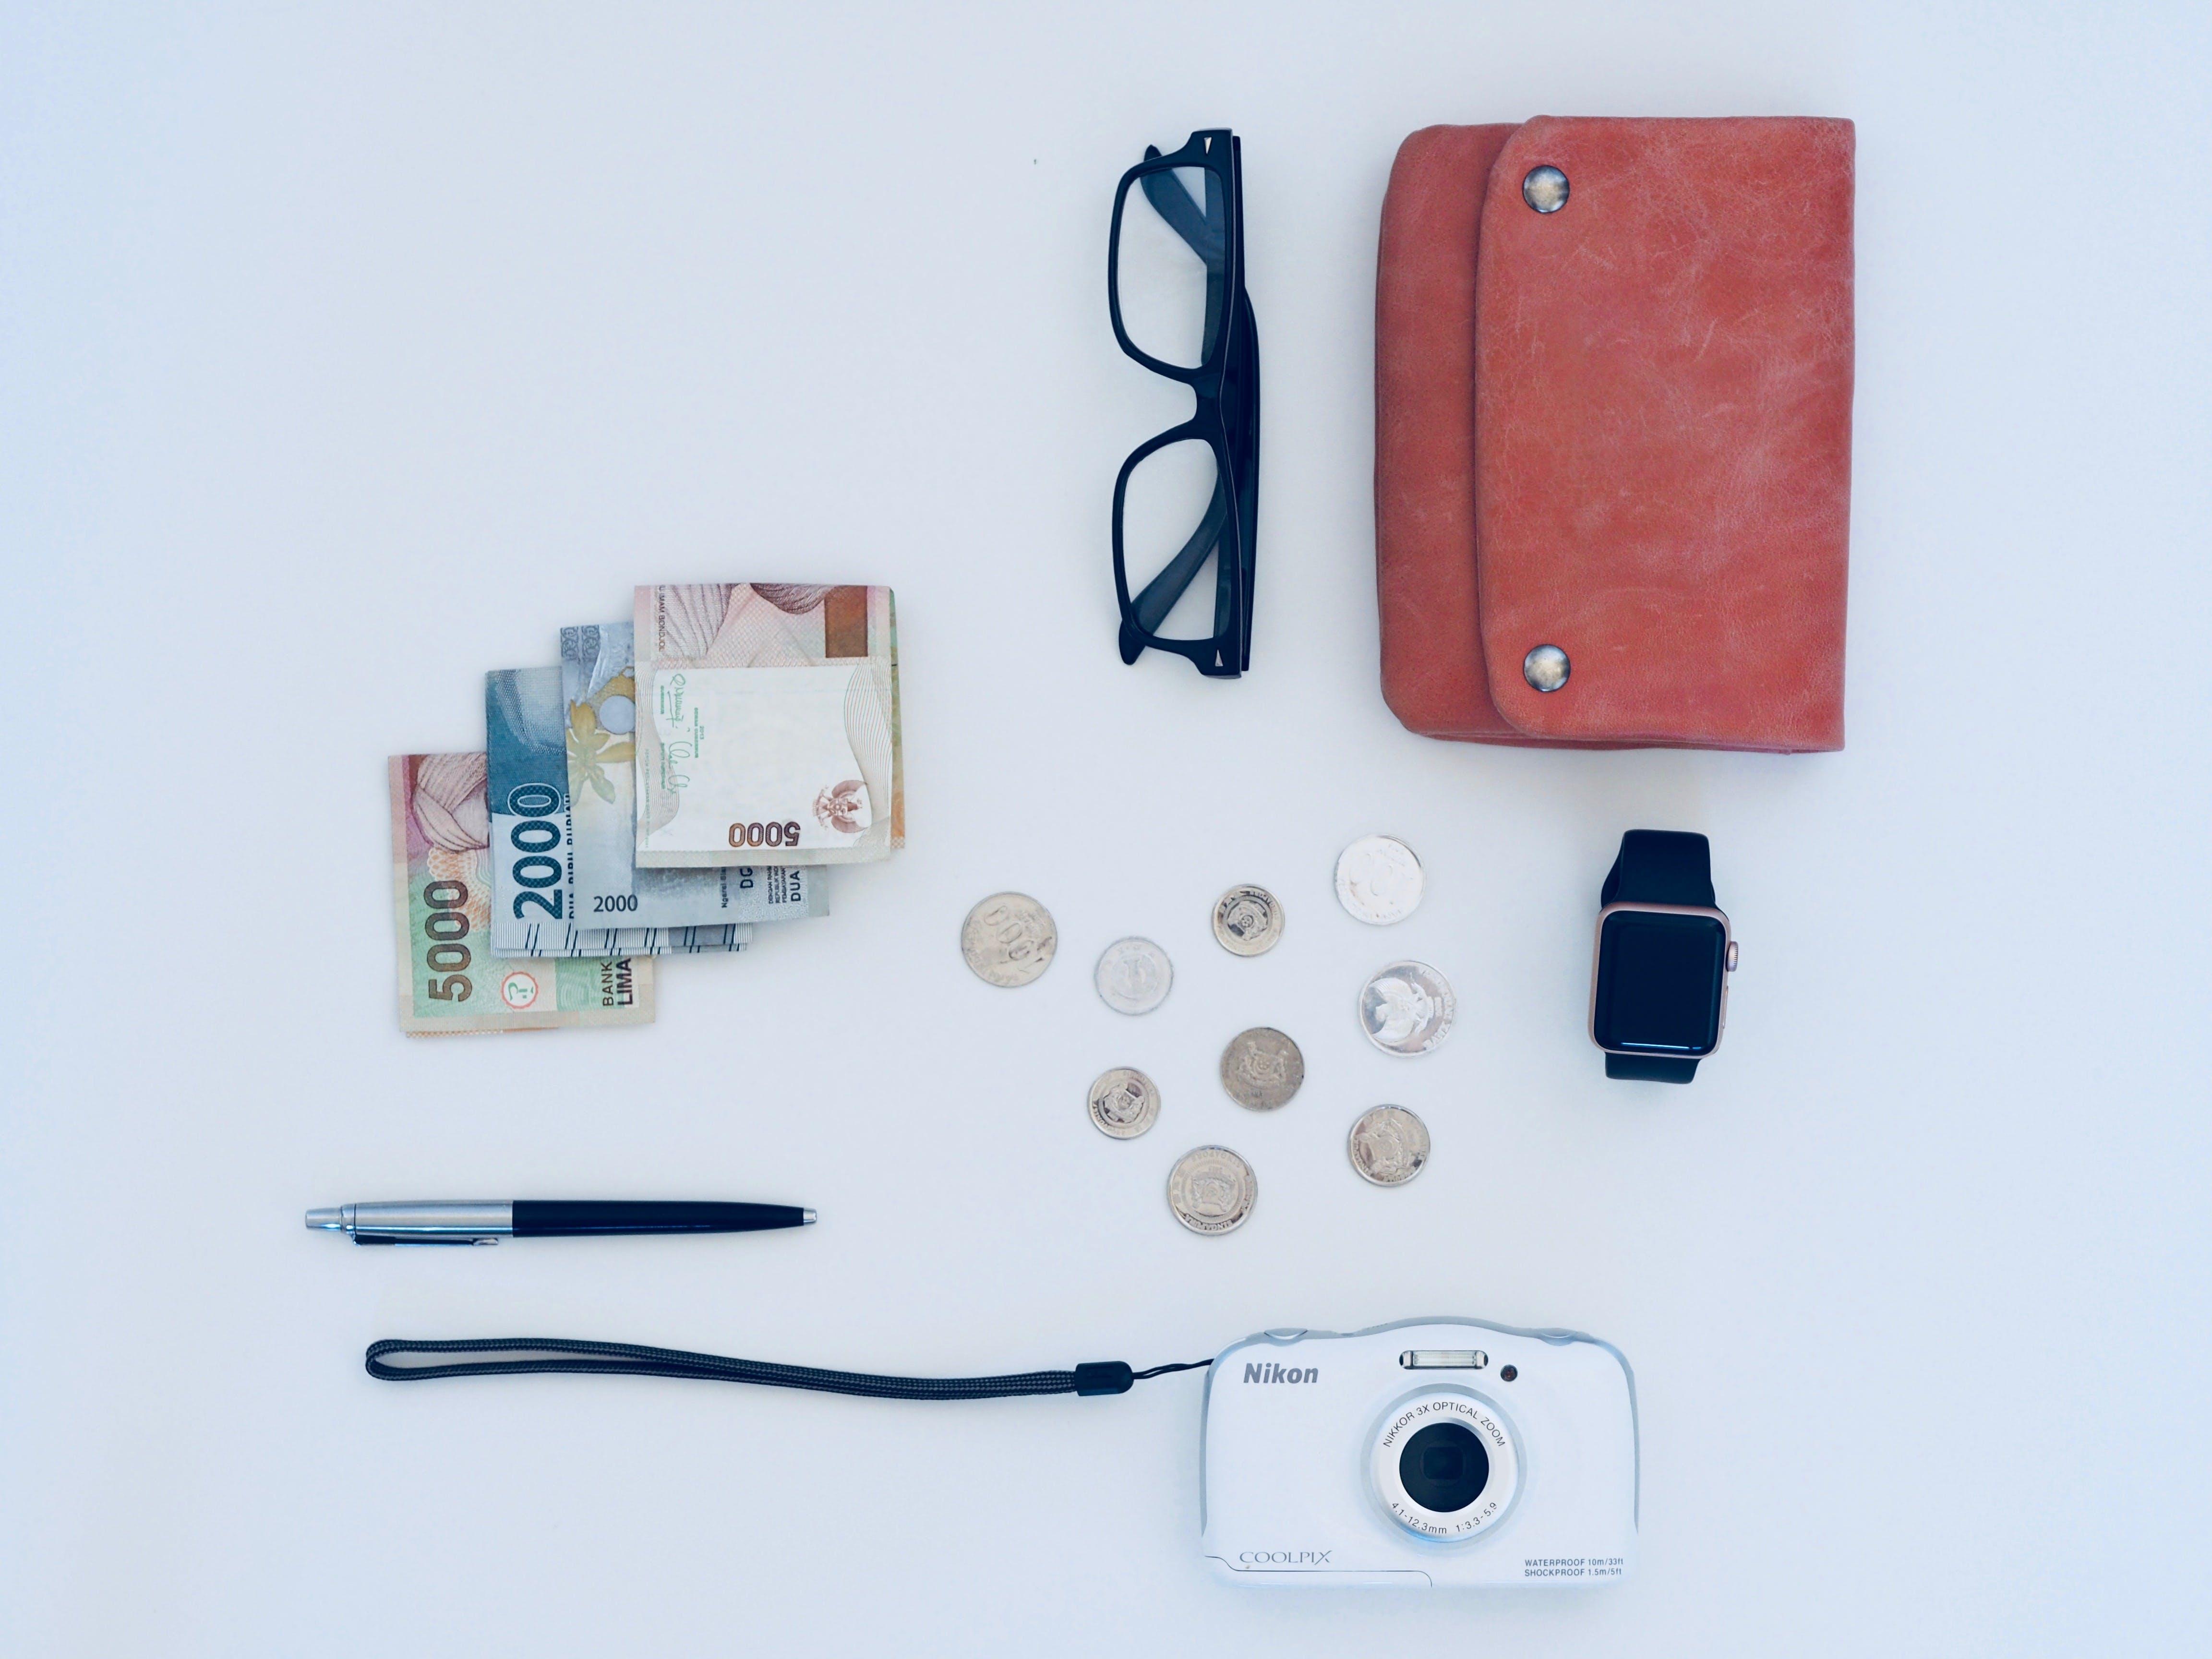 White Camera And Eyeglasses With Black Frame